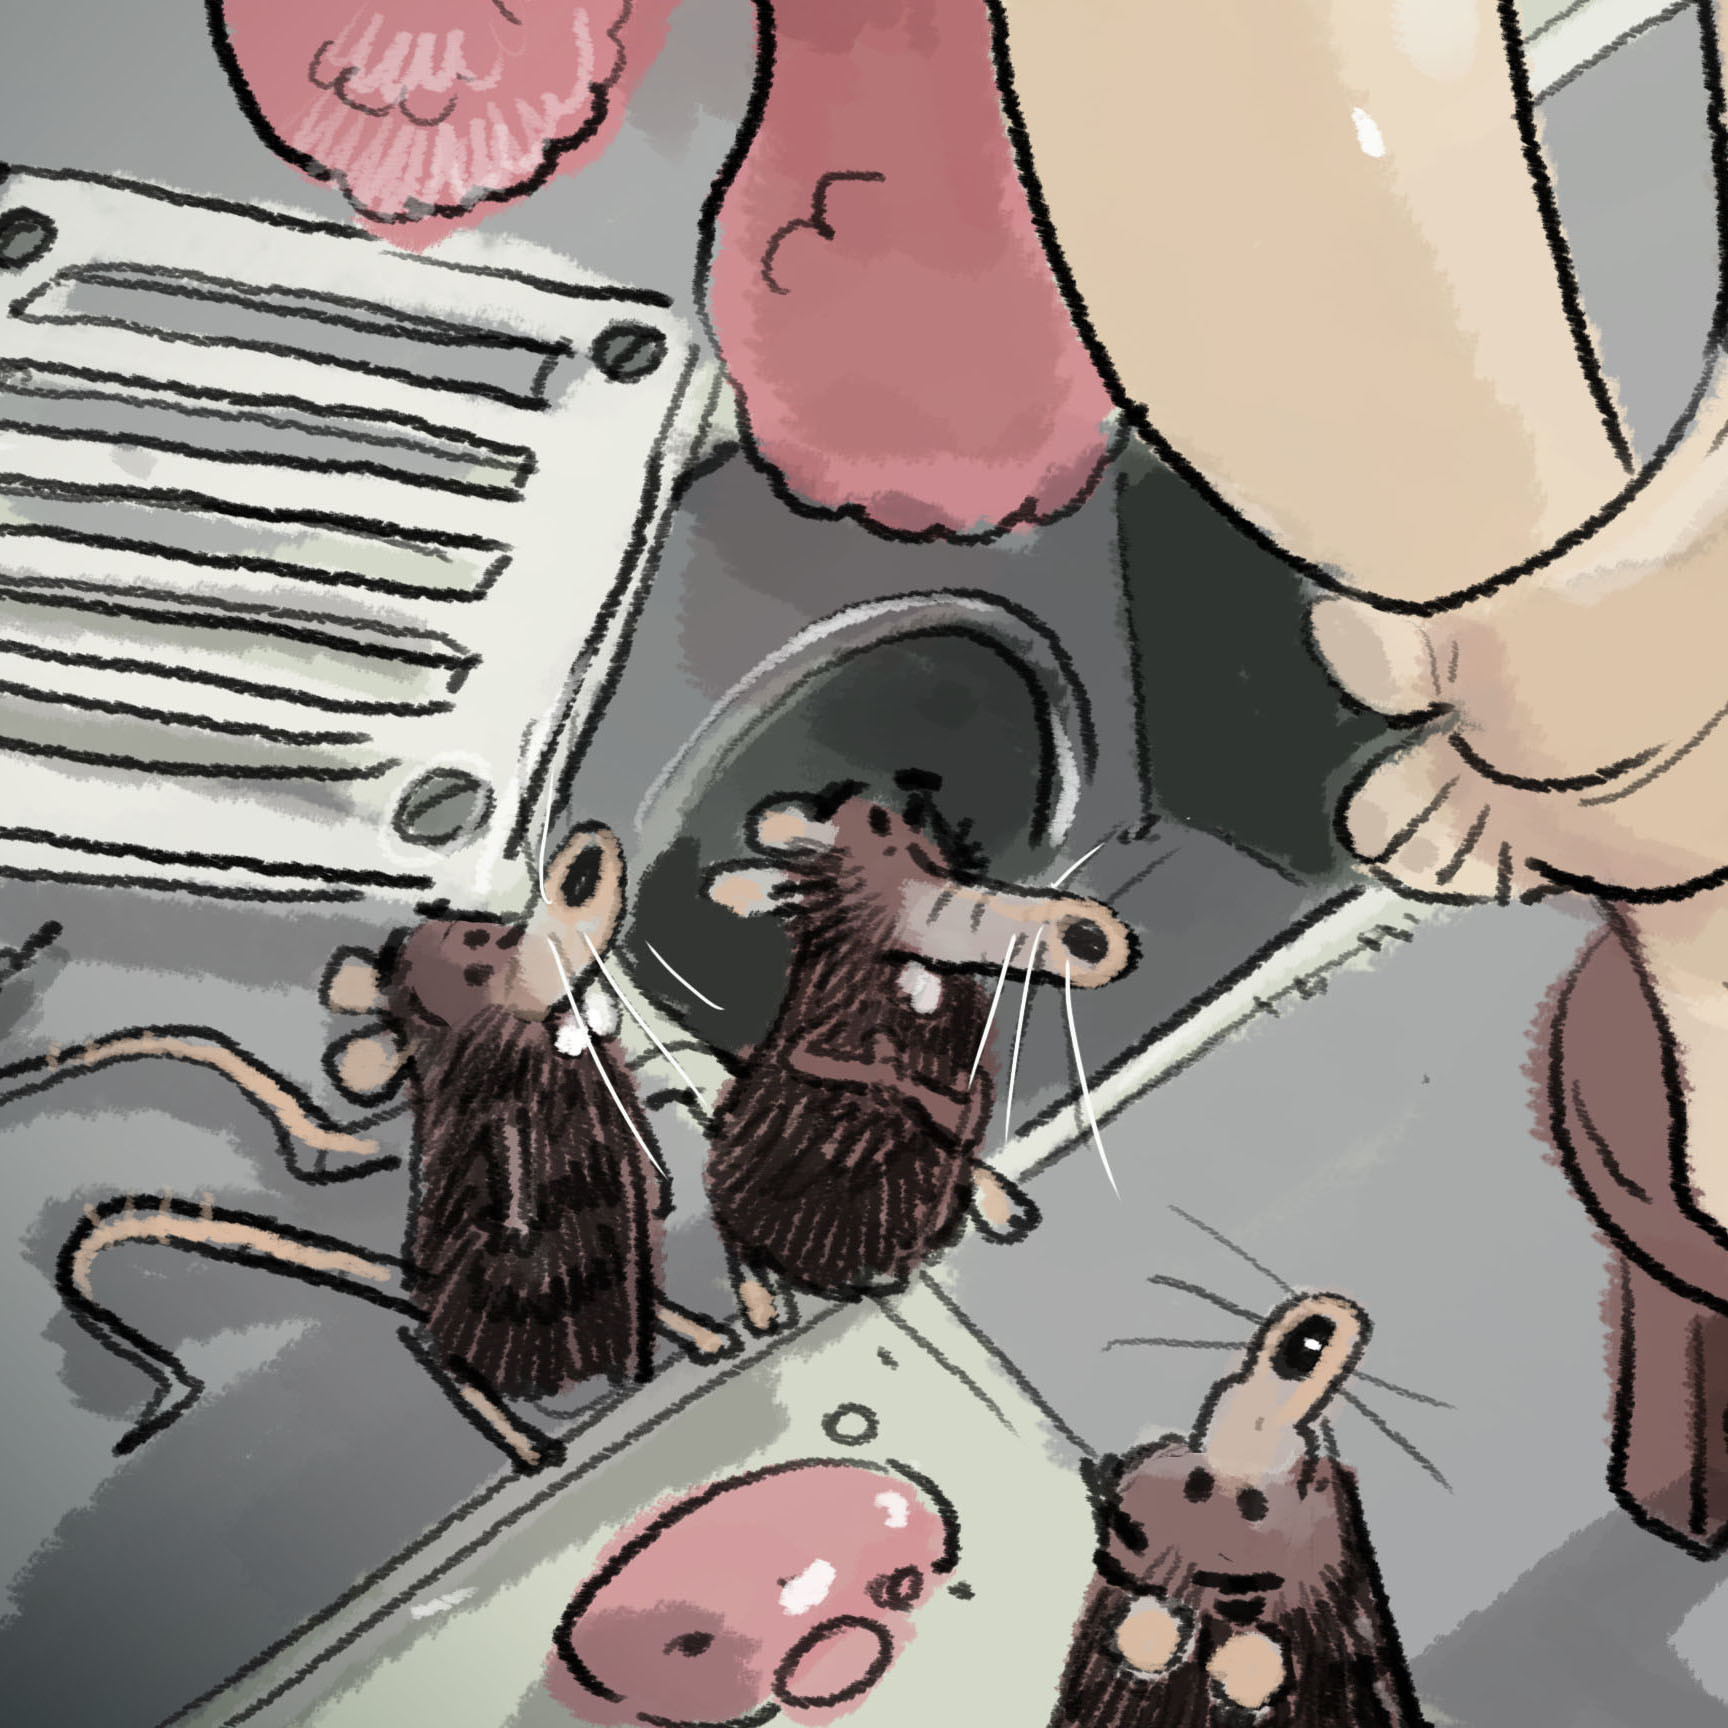 Guillermo casas ratones1